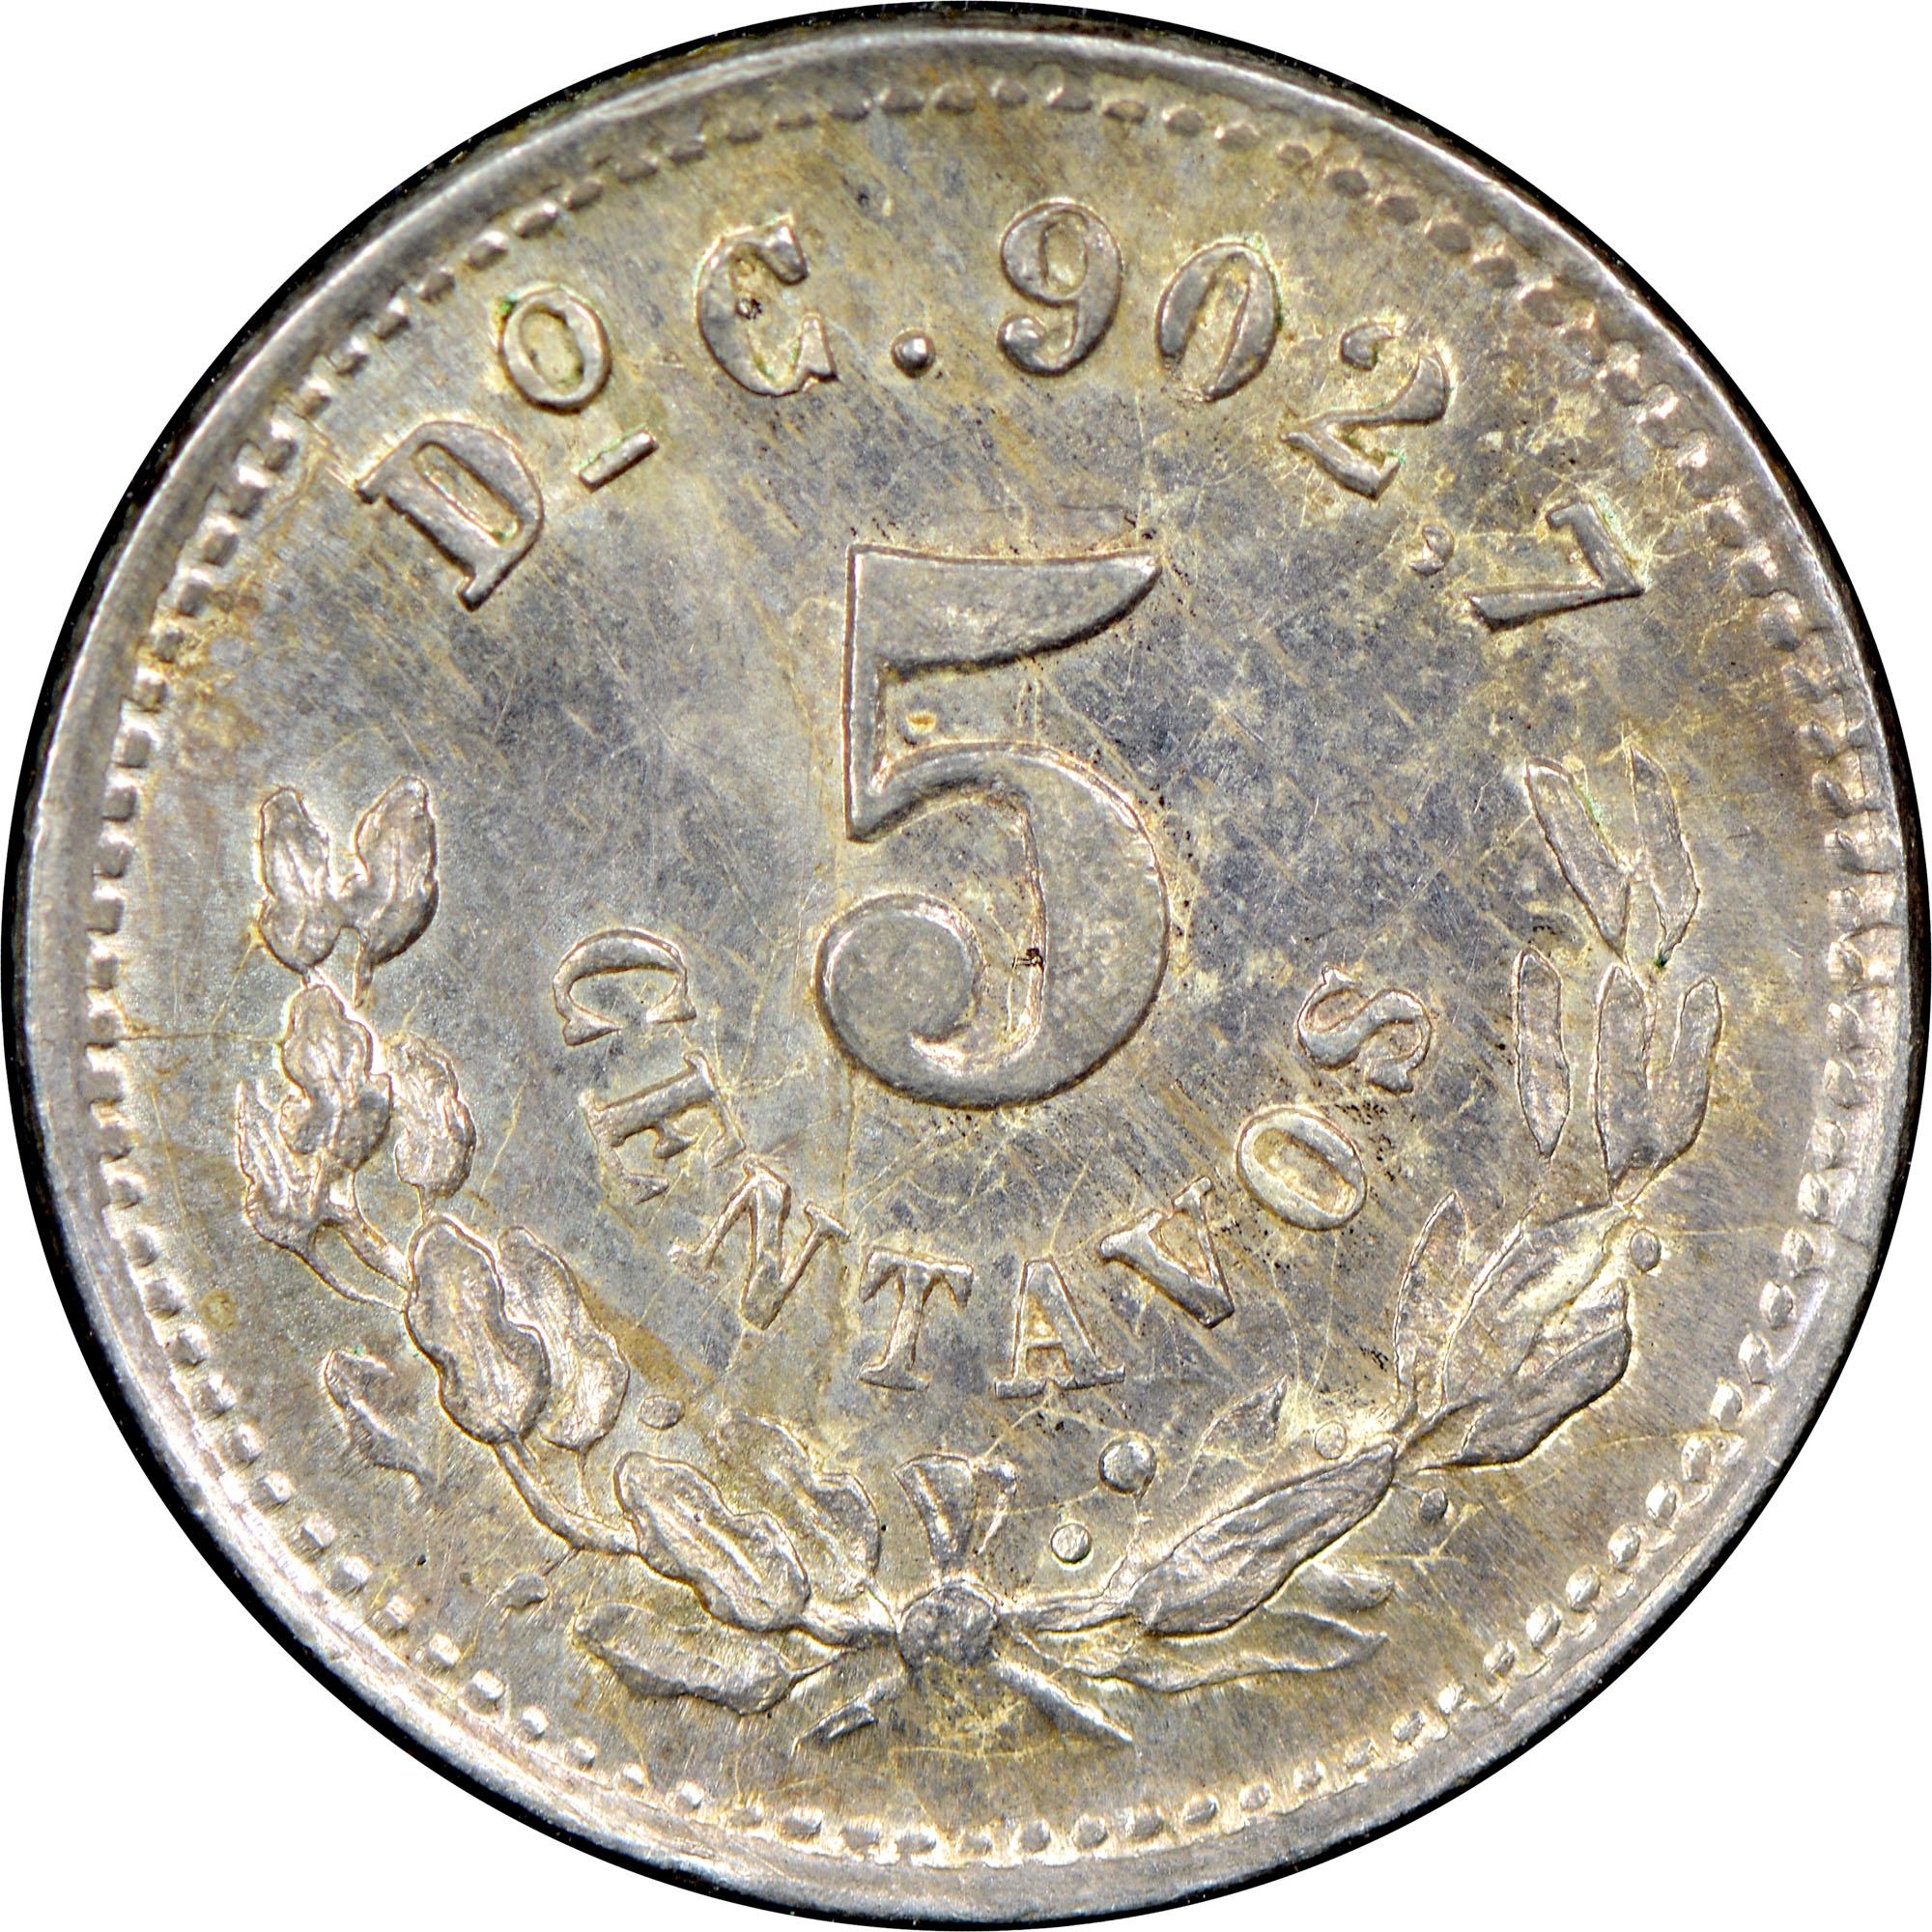 1874-1894 Mexico 5 Centavos reverse